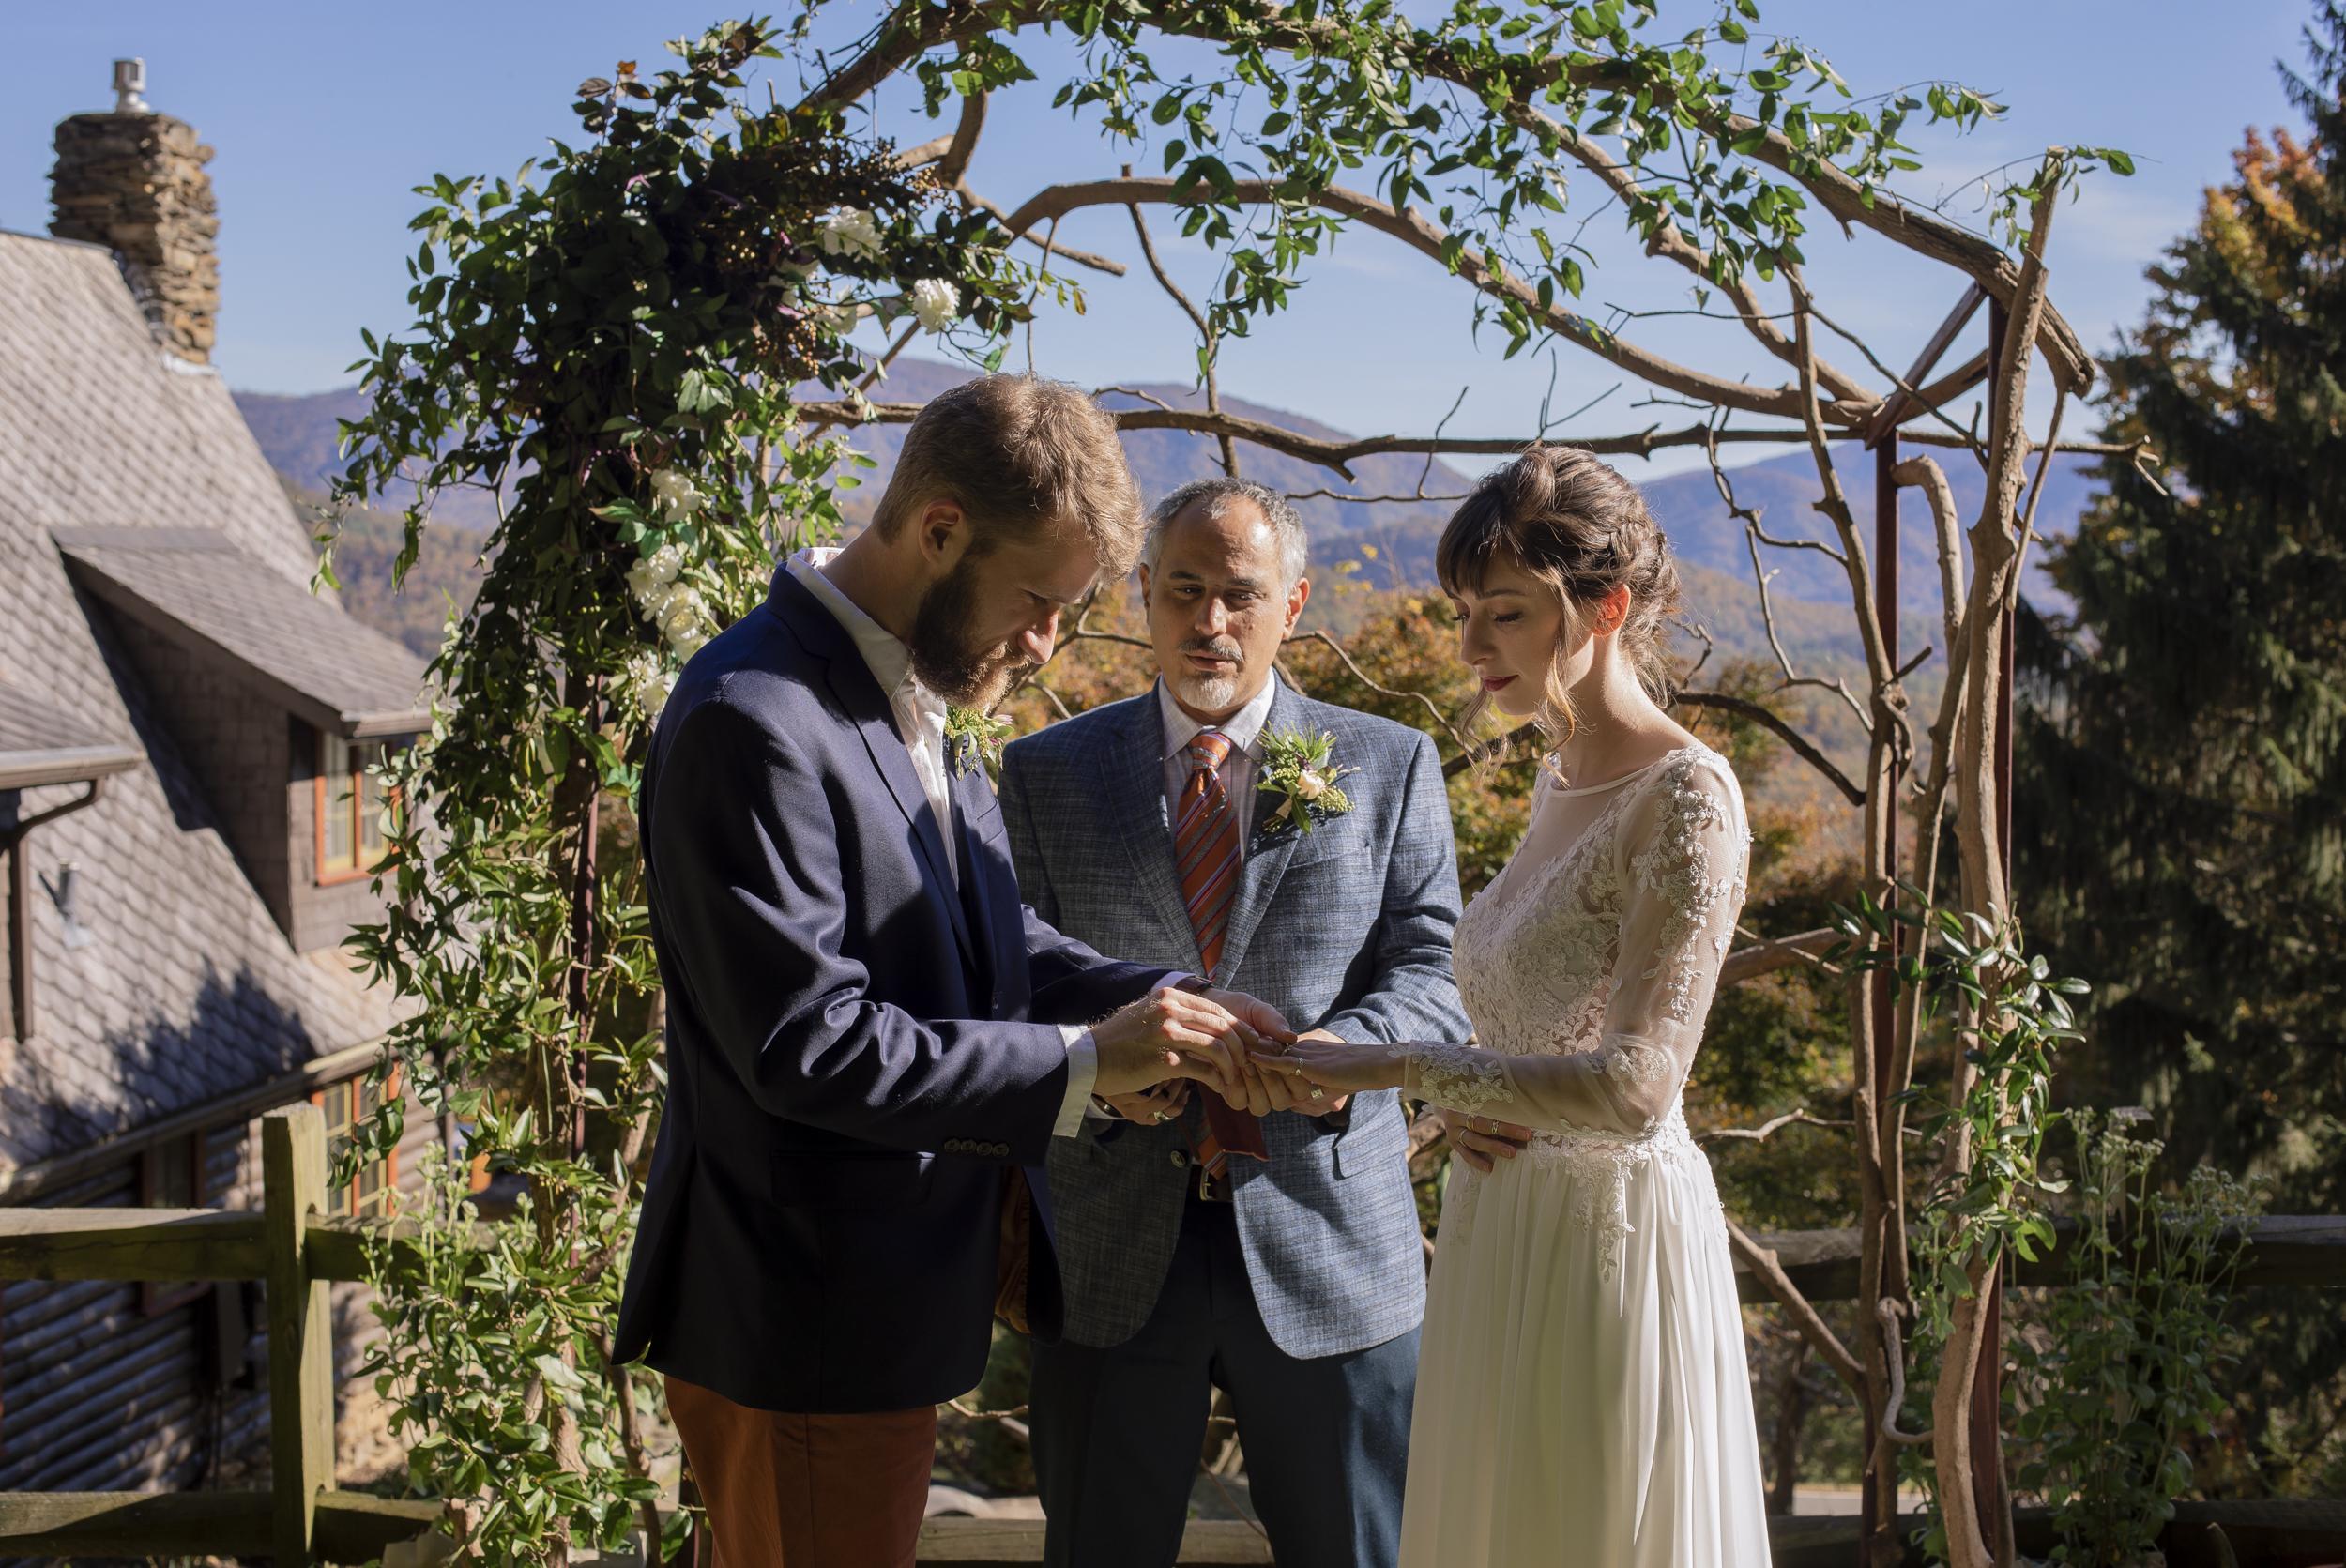 Laurel Falls Wedding October 2018_Allison and Josh__Lola Salon_Flora_Photo by Studio Misha Photography-33.jpg